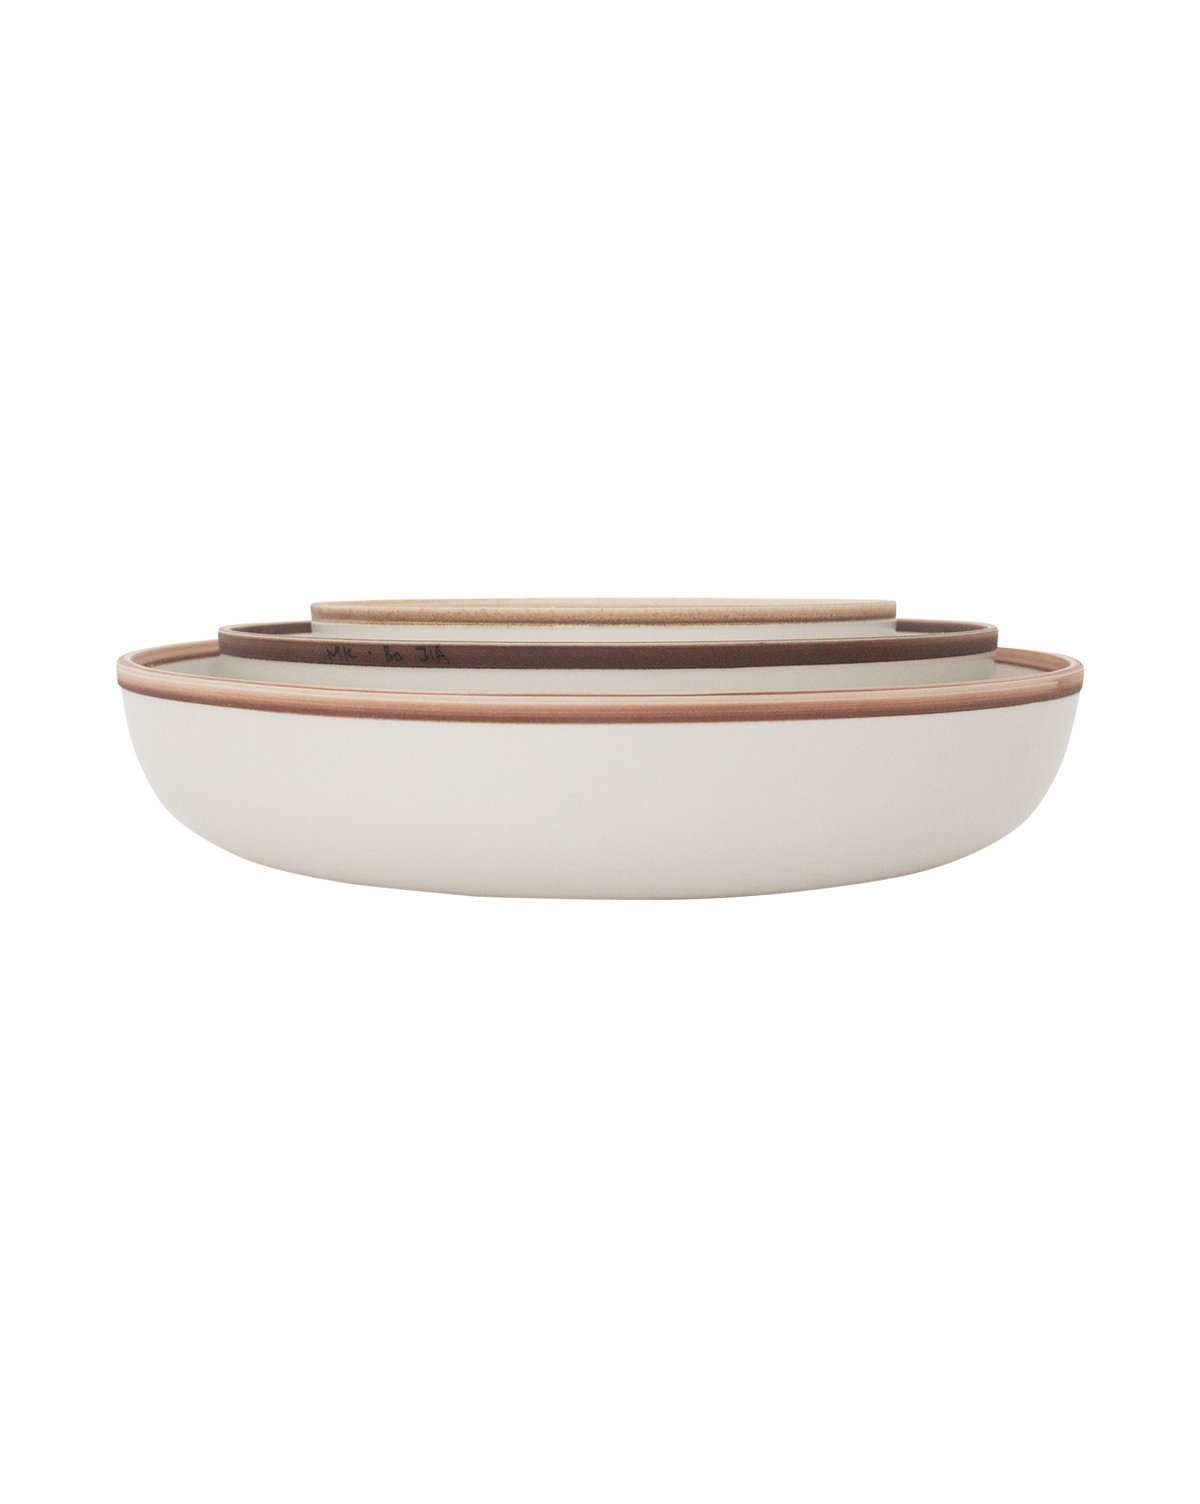 Glazed_Porcelain_Bowls_1 (1).jpg